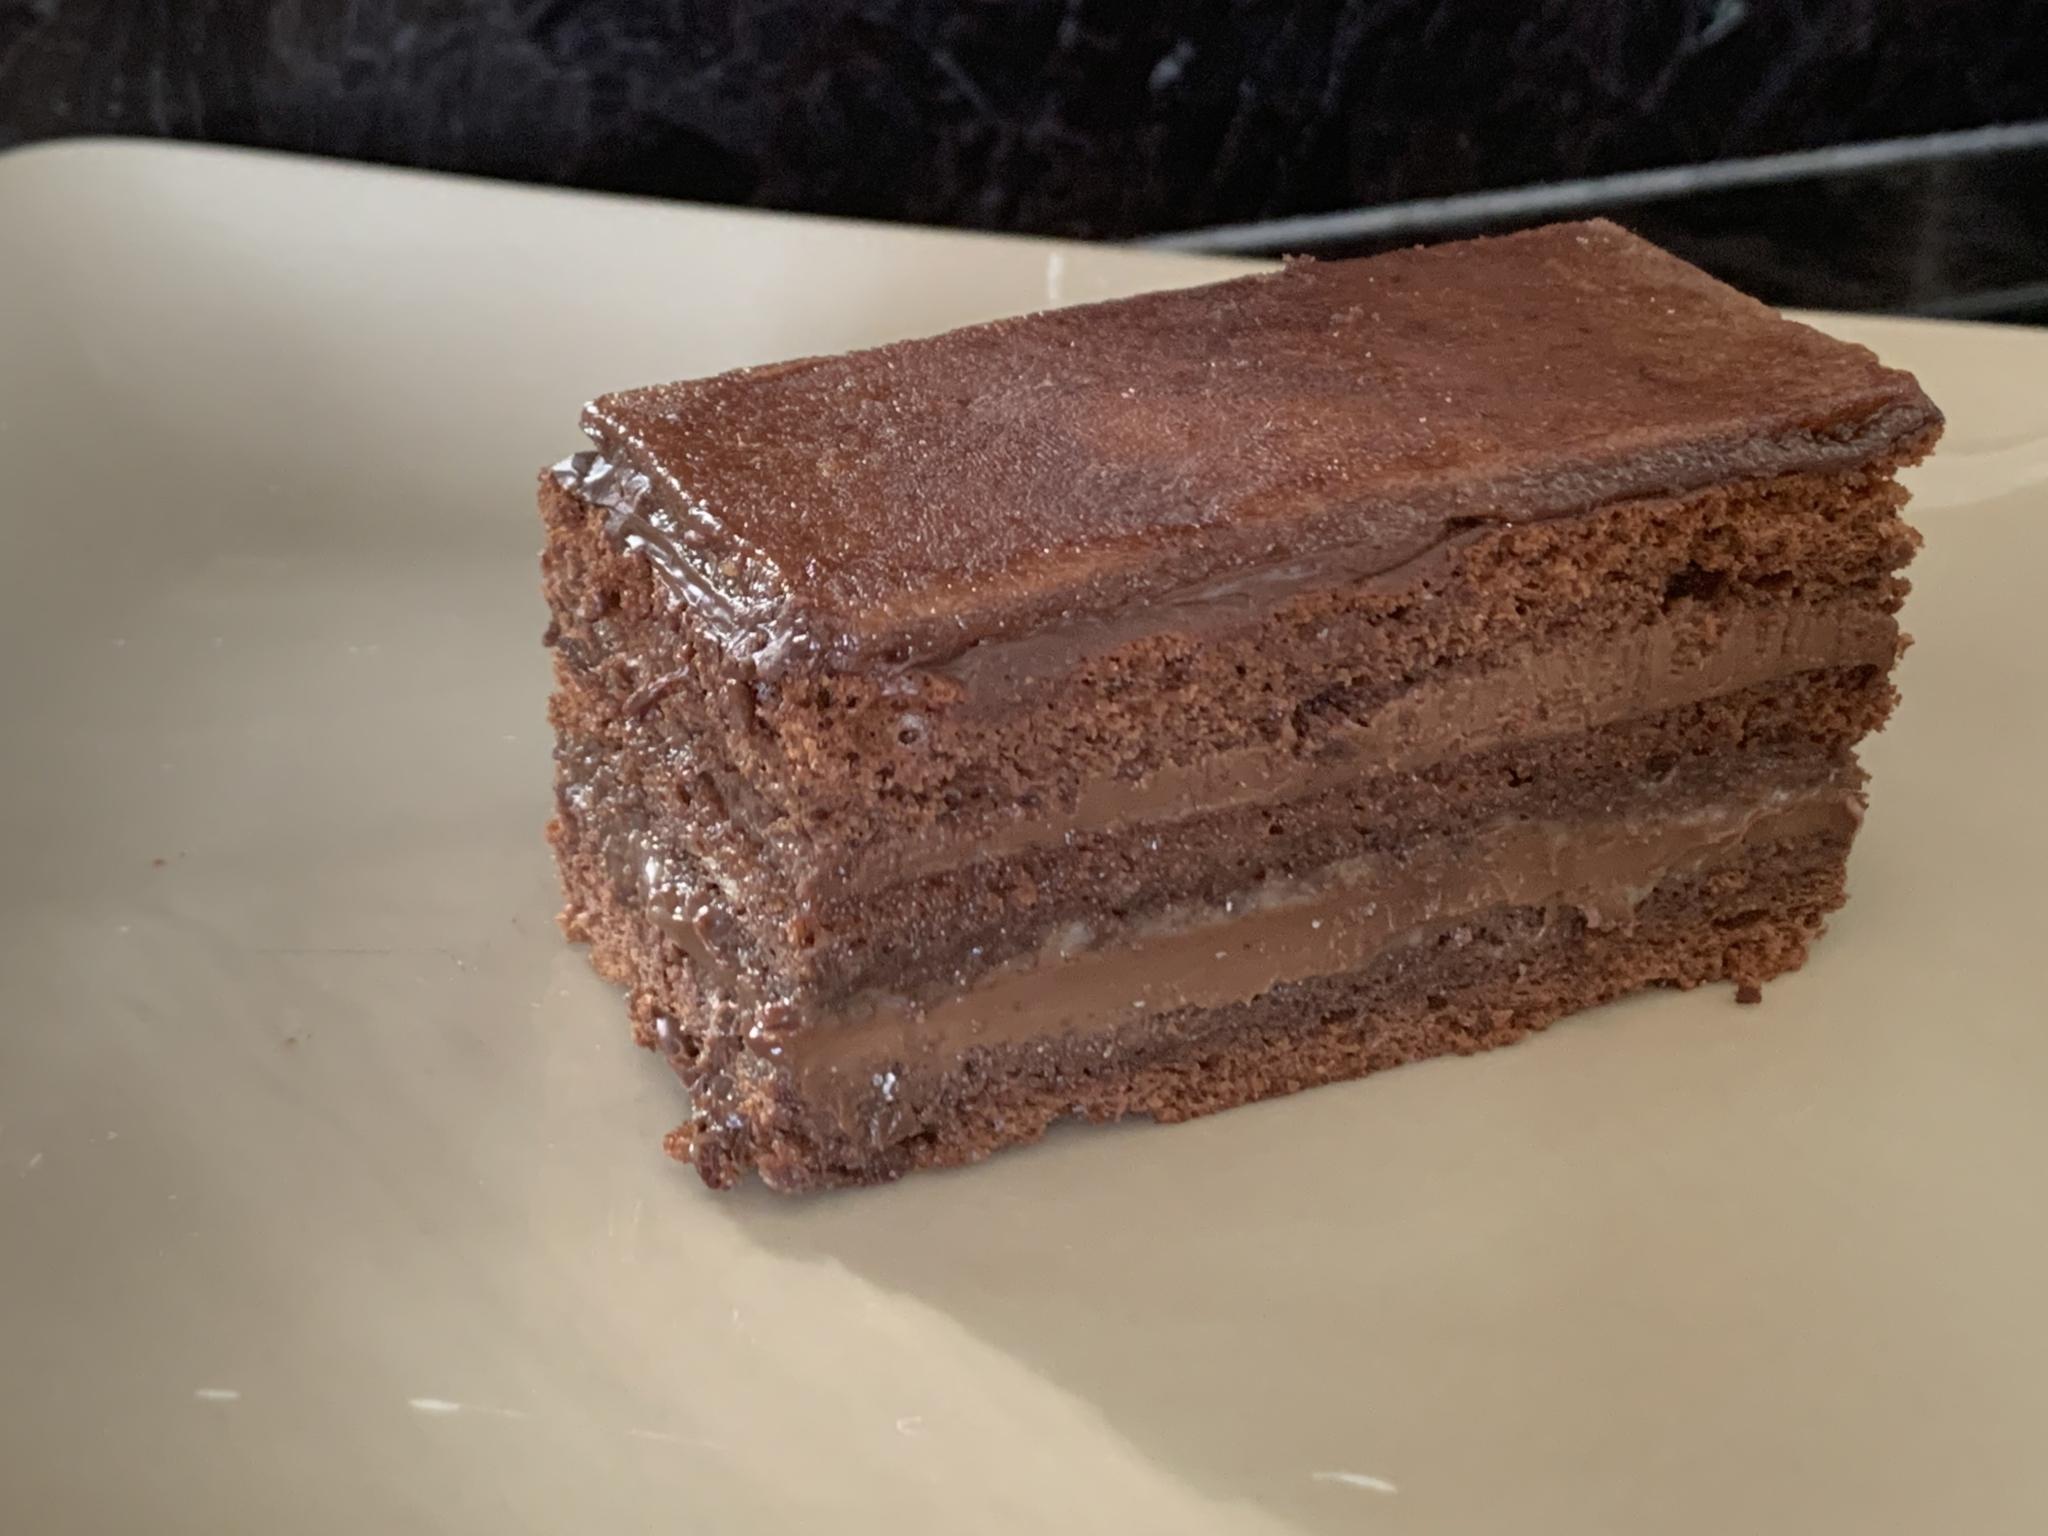 Cake de poche chocolat caramel adapté sans gluten d'une recette de Nicolas Bernadé